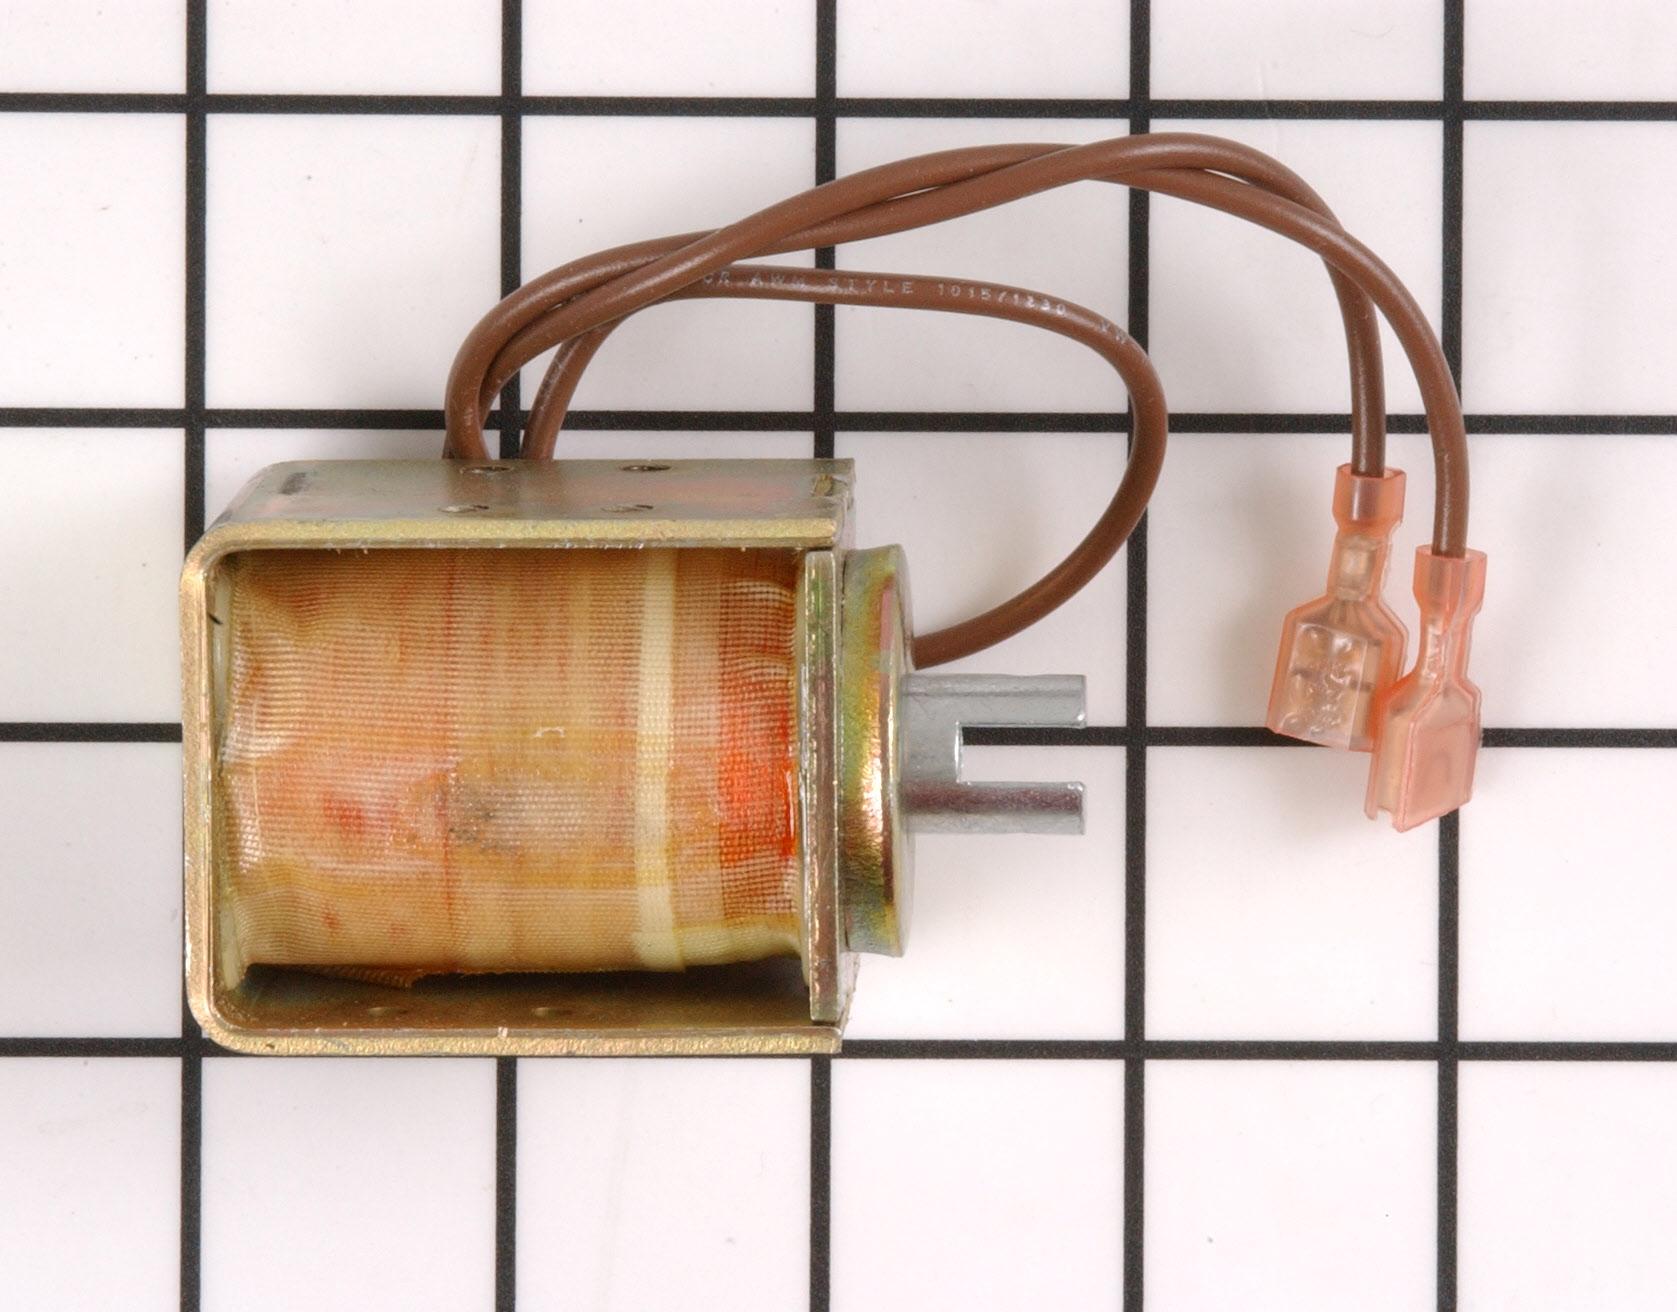 WP67883-3 Crosley Refrigerator Part -Dispenser Solenoid